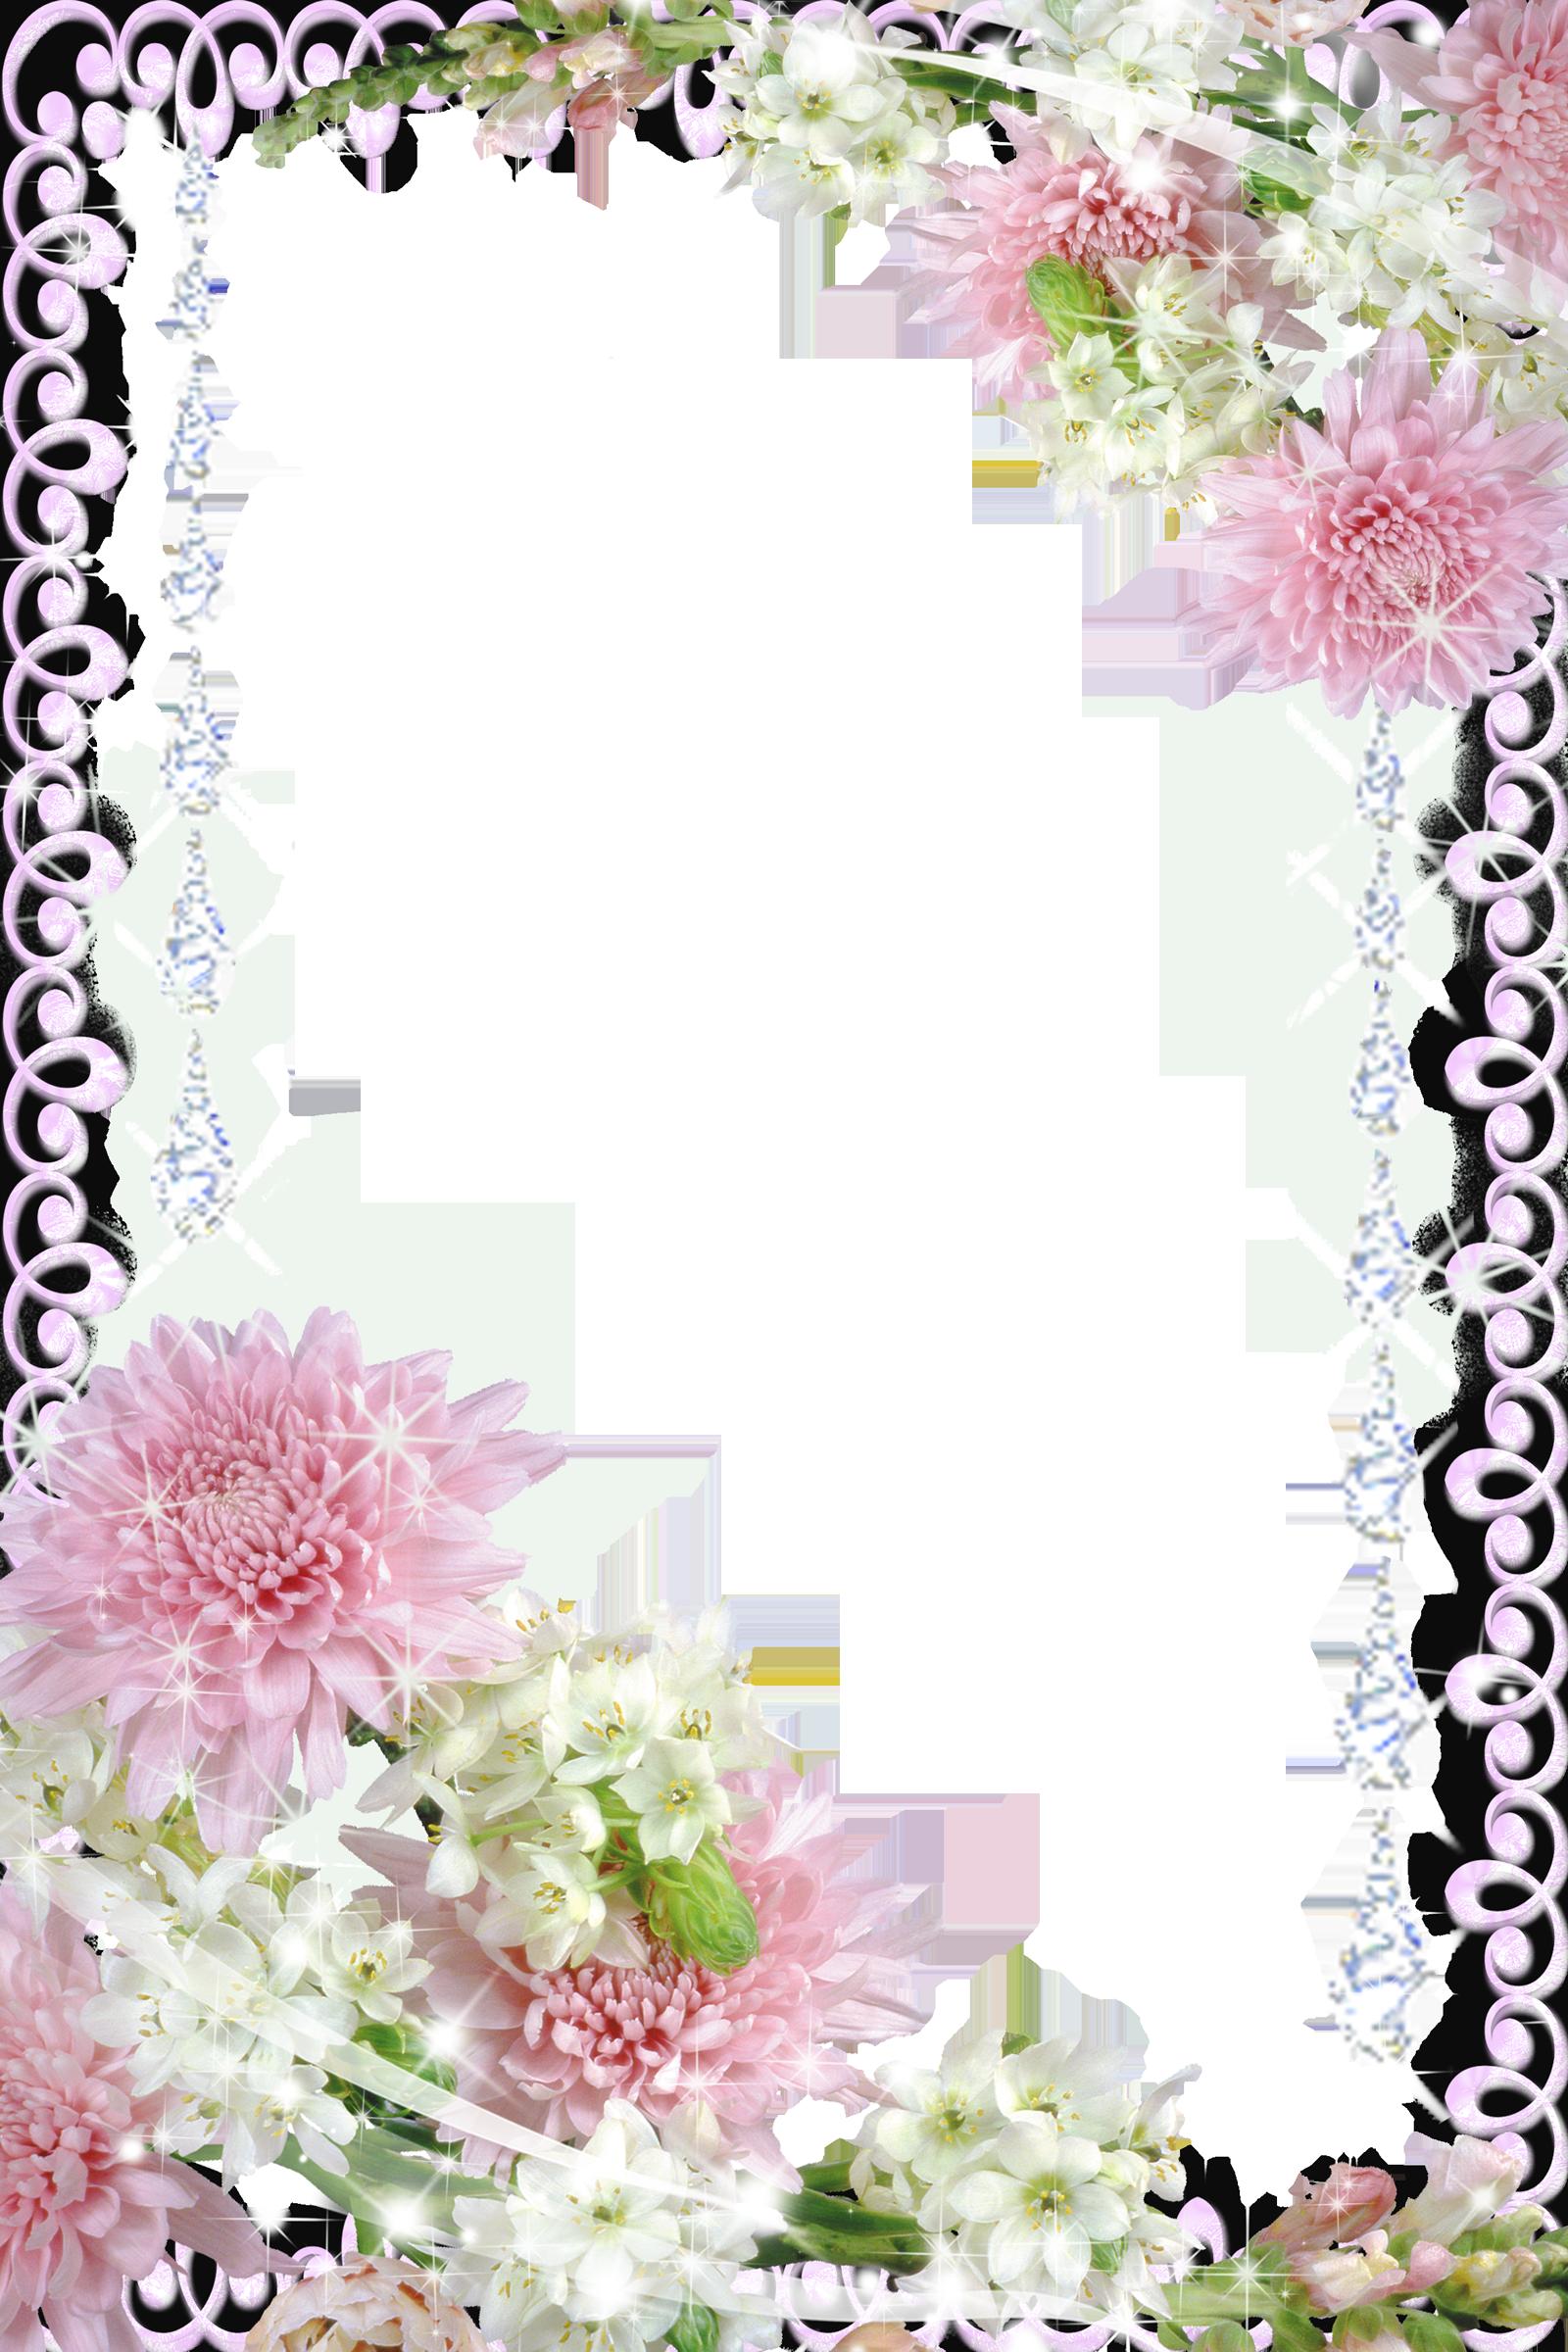 Real Flowers Transparent PNG Photo Frame Flower frame